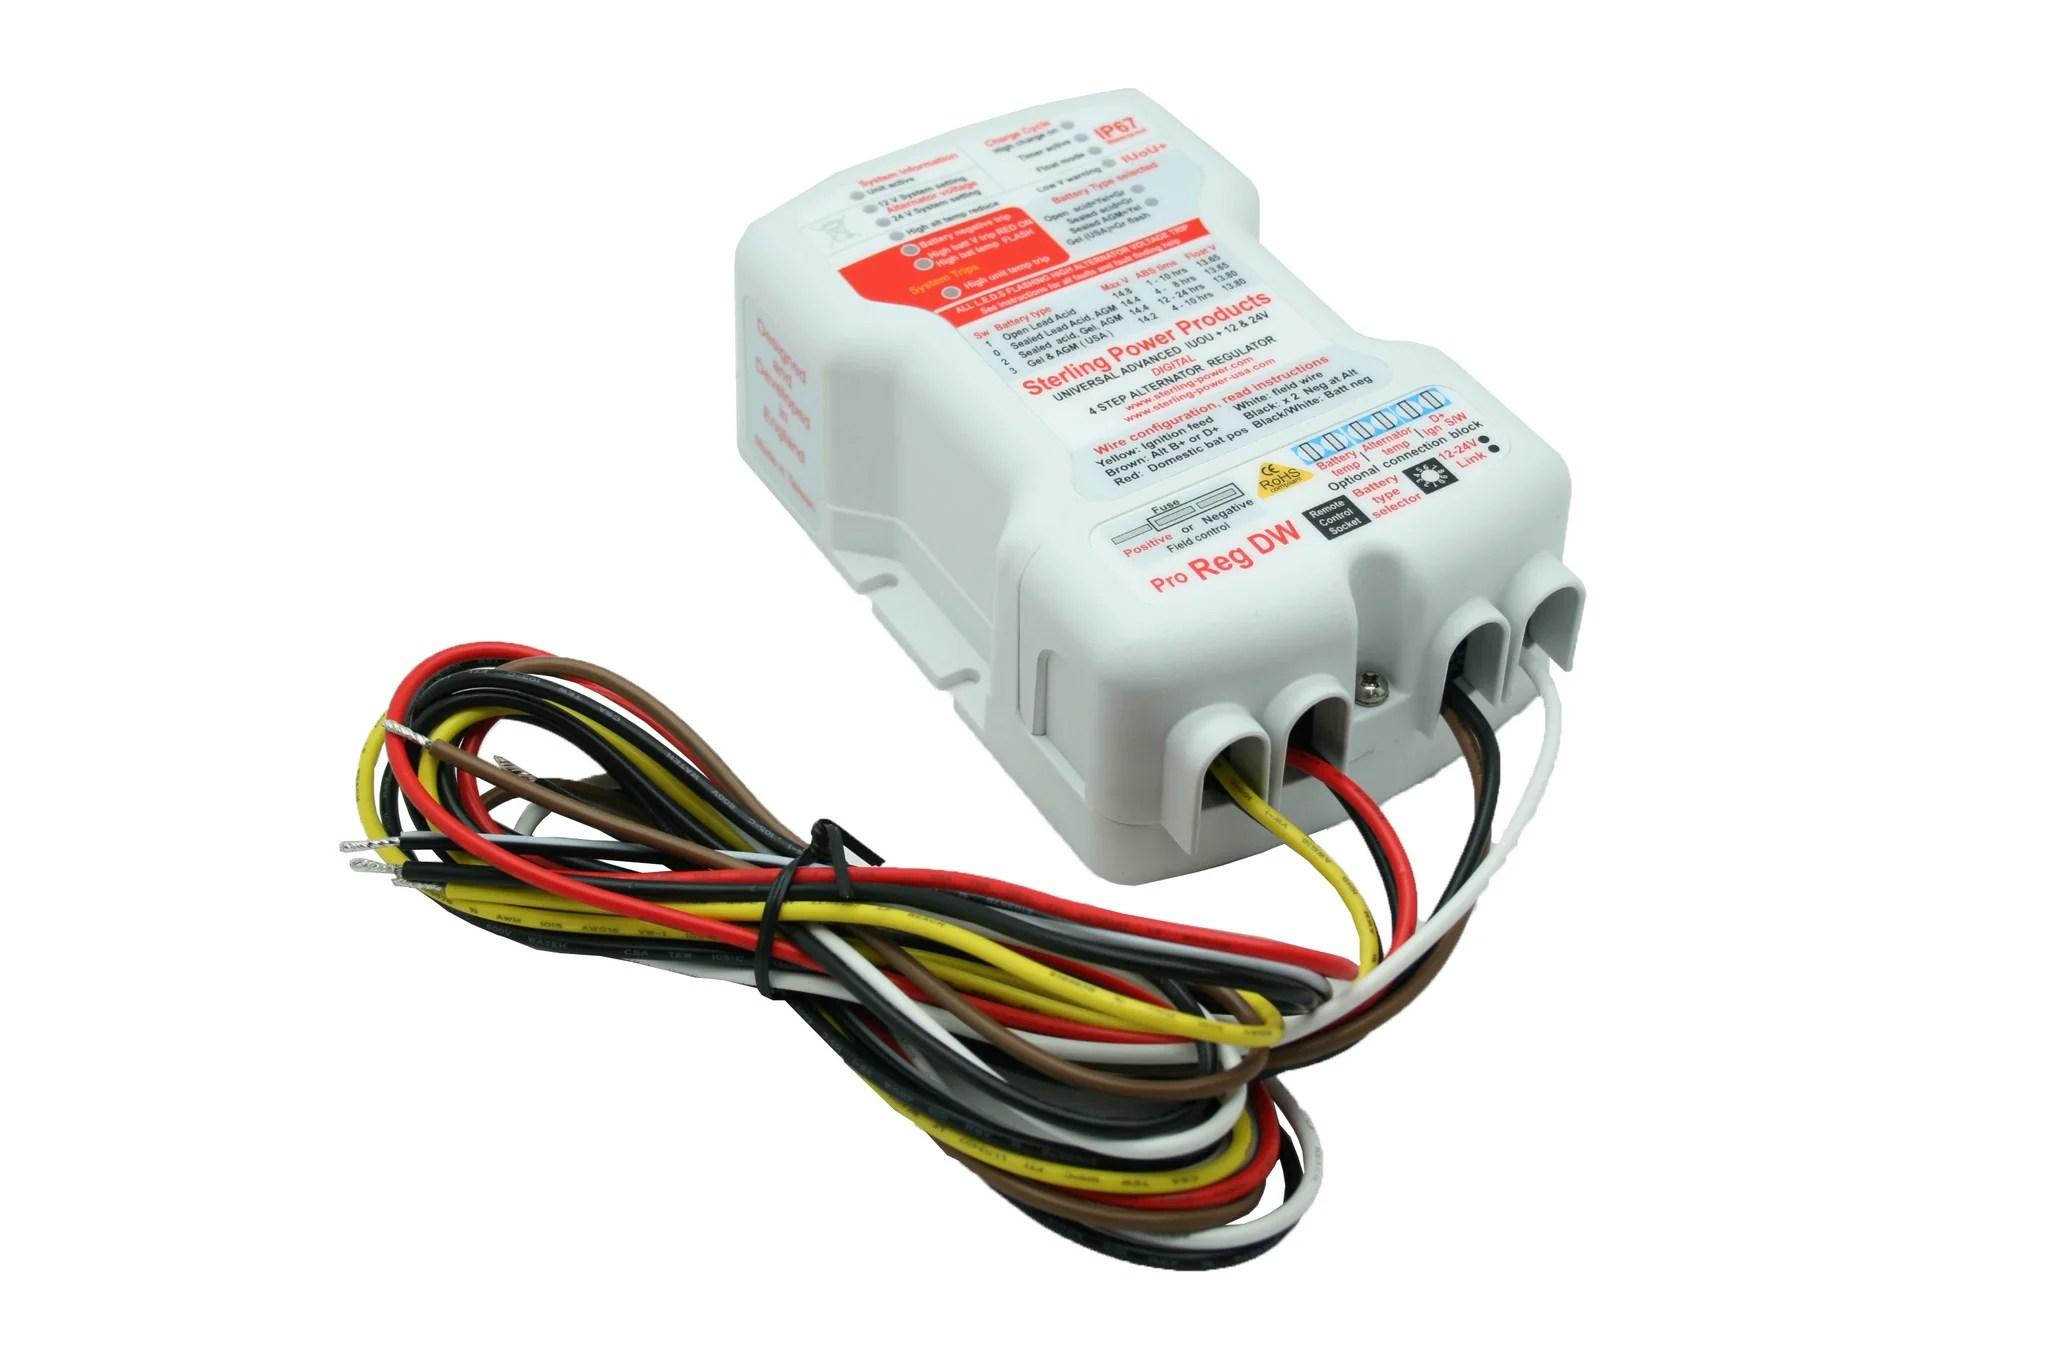 medium resolution of universal advanced digital alternator regulator pro reg dw waterproof pdarw 220 80 products